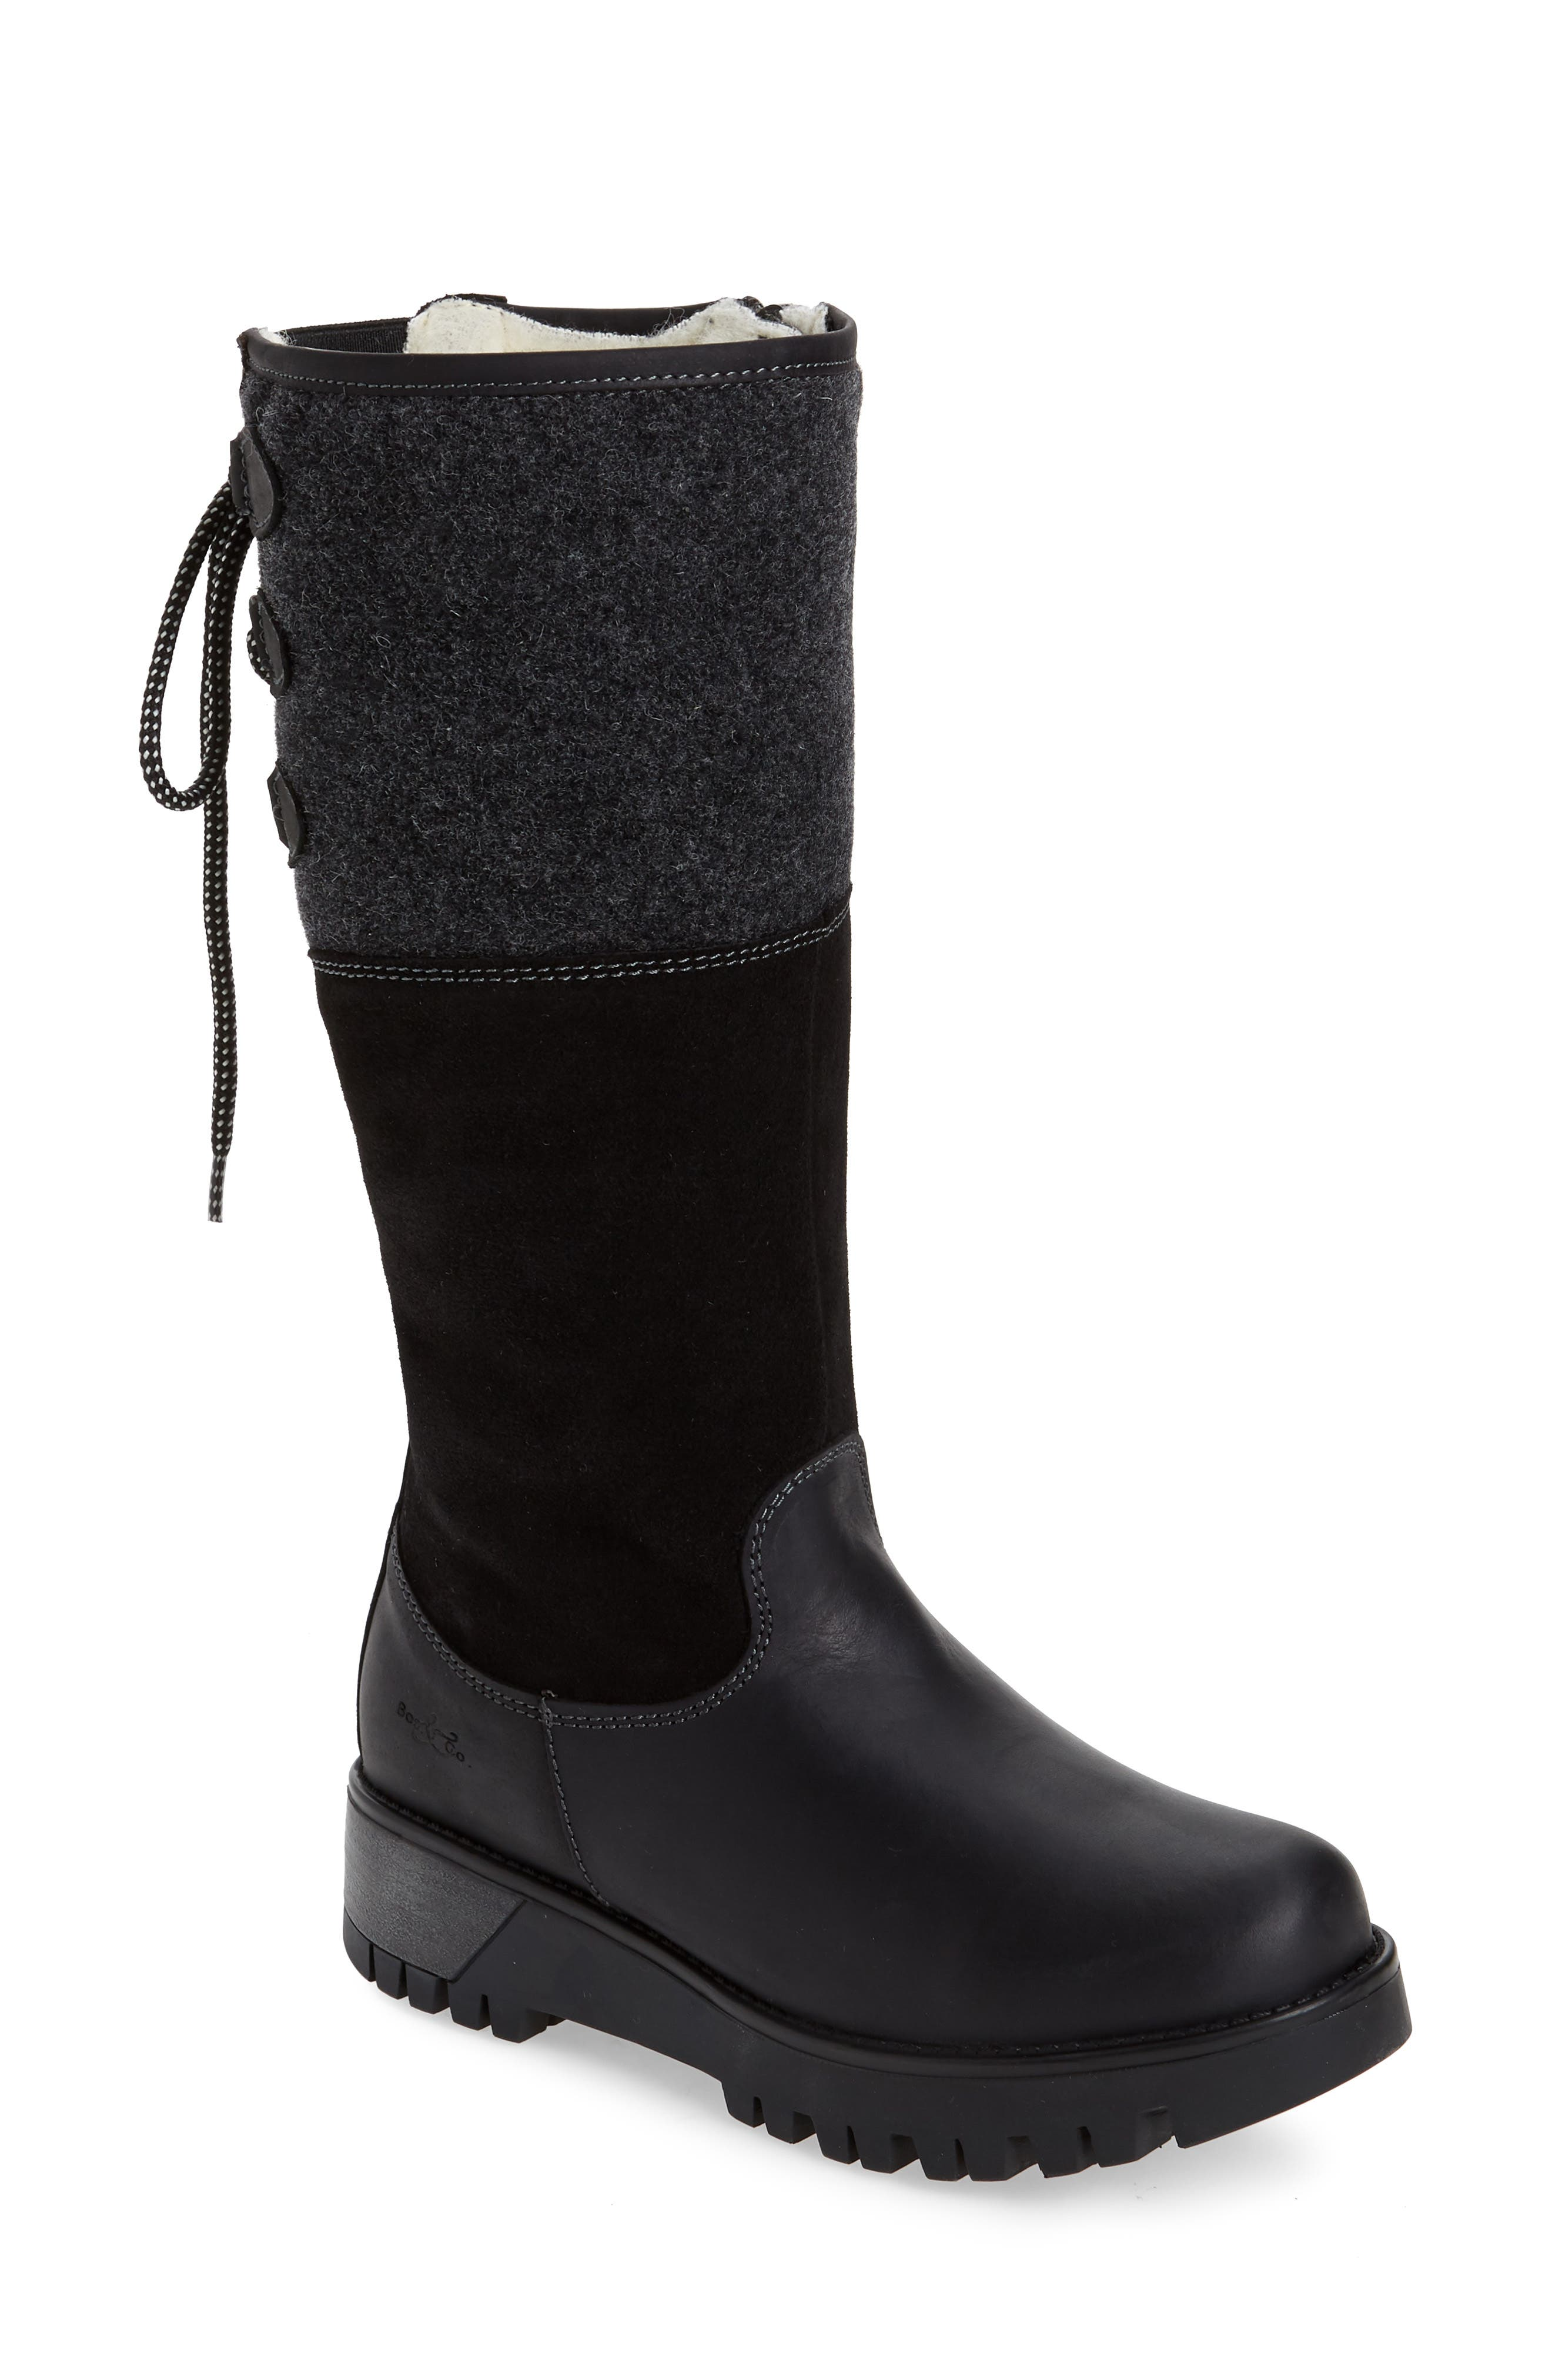 Goose Primaloft Waterproof Boiled Wool Mid Calf Boot